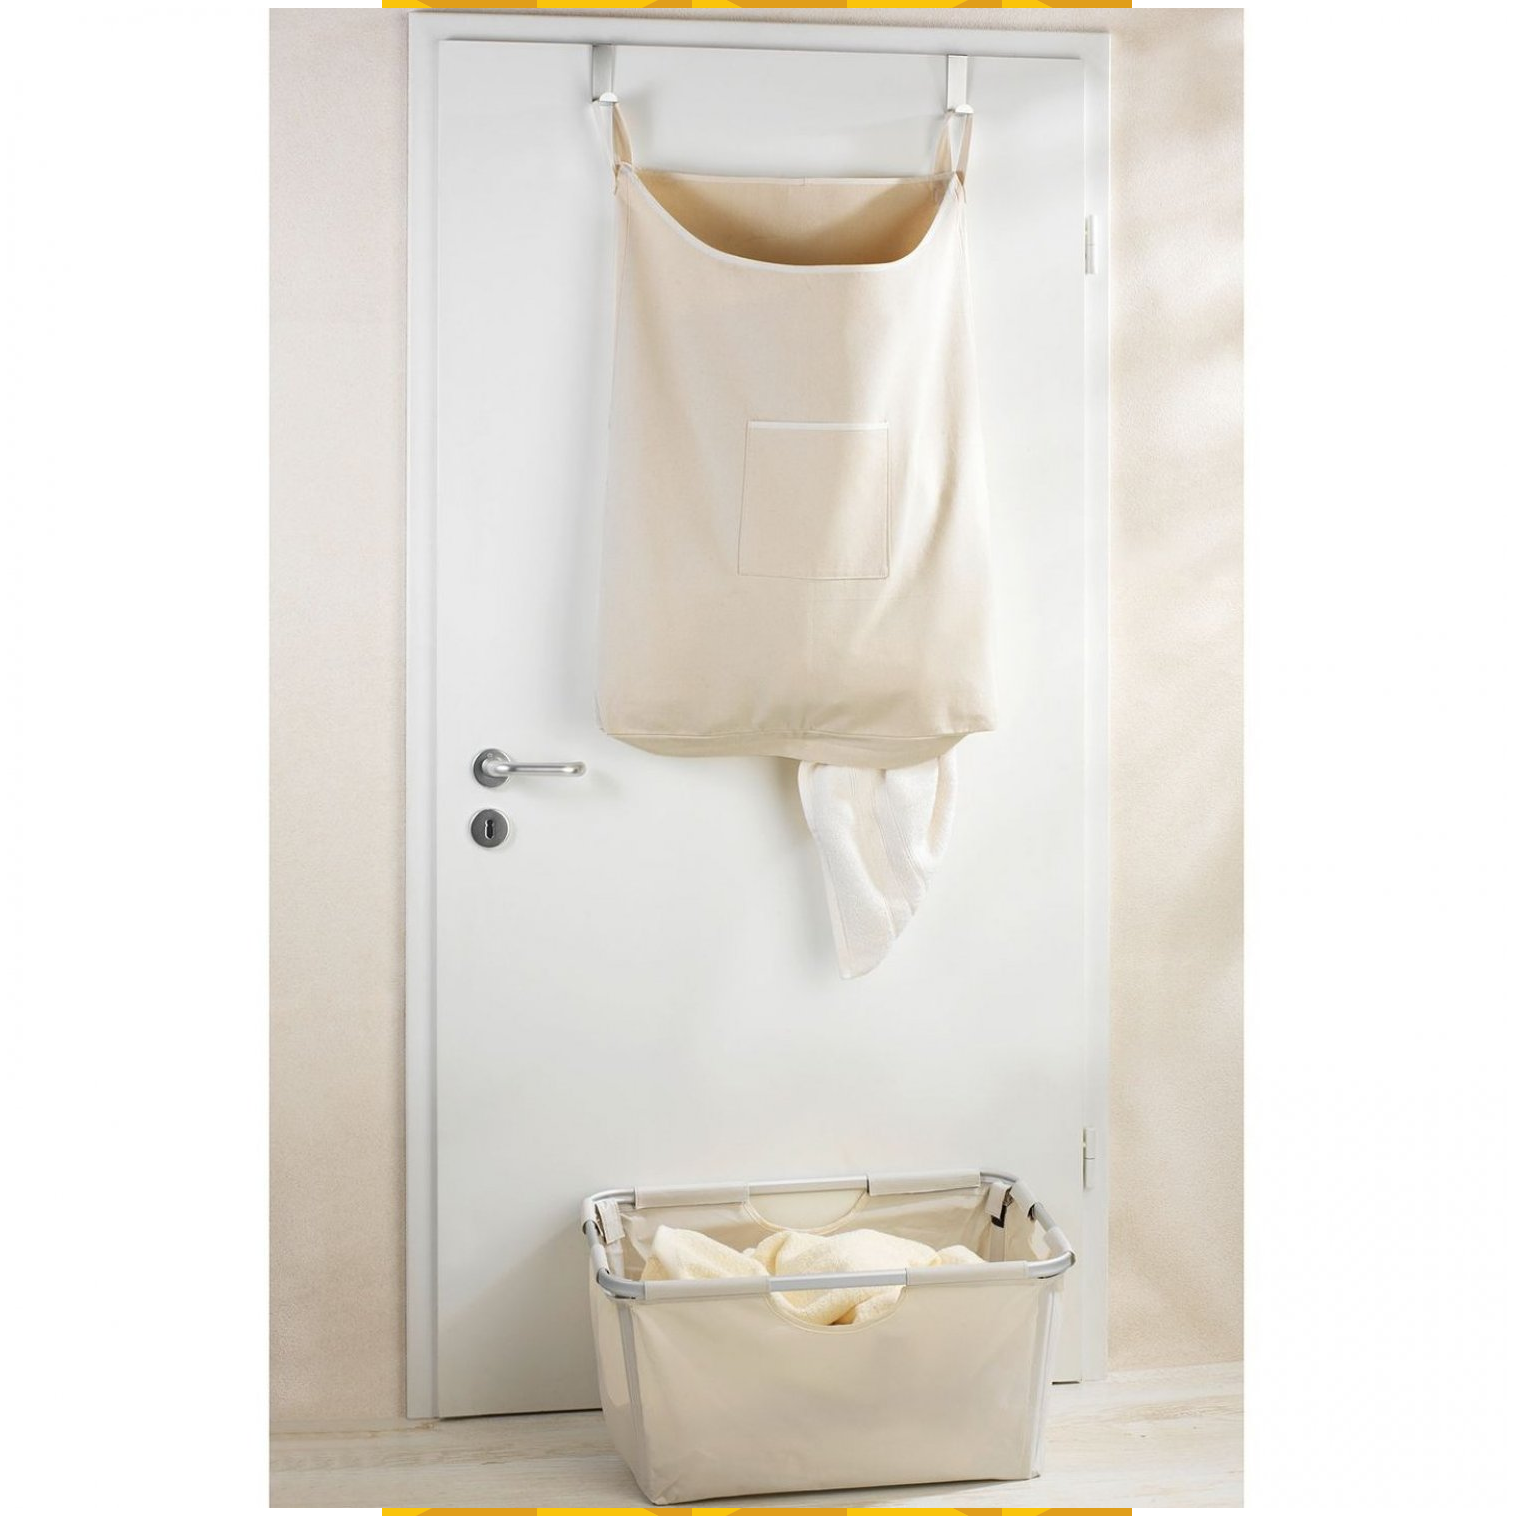 Waeschesammler Canguro In 2020 Hanging Laundry Bag Laundry Room Storage Laundry Bag